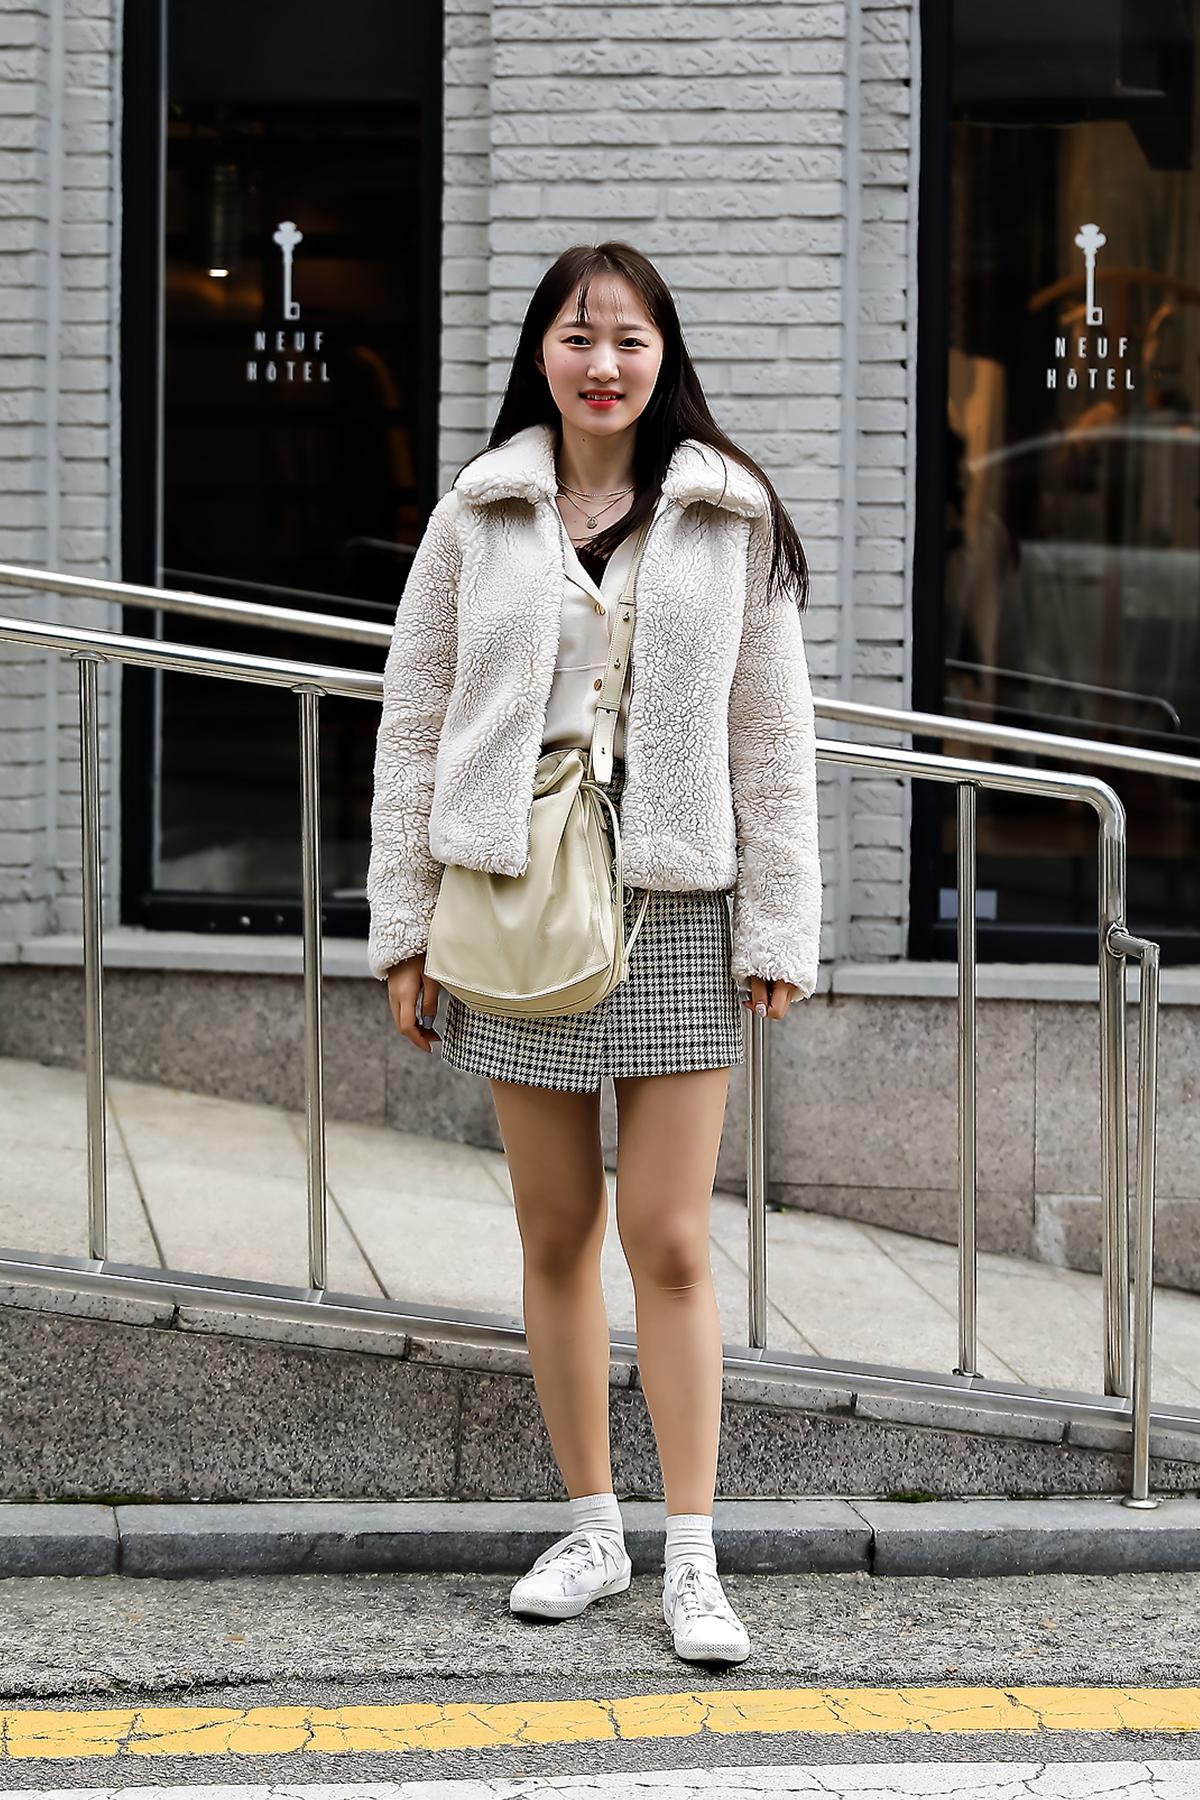 Women fall street style last week of october 2018 inseoul 1